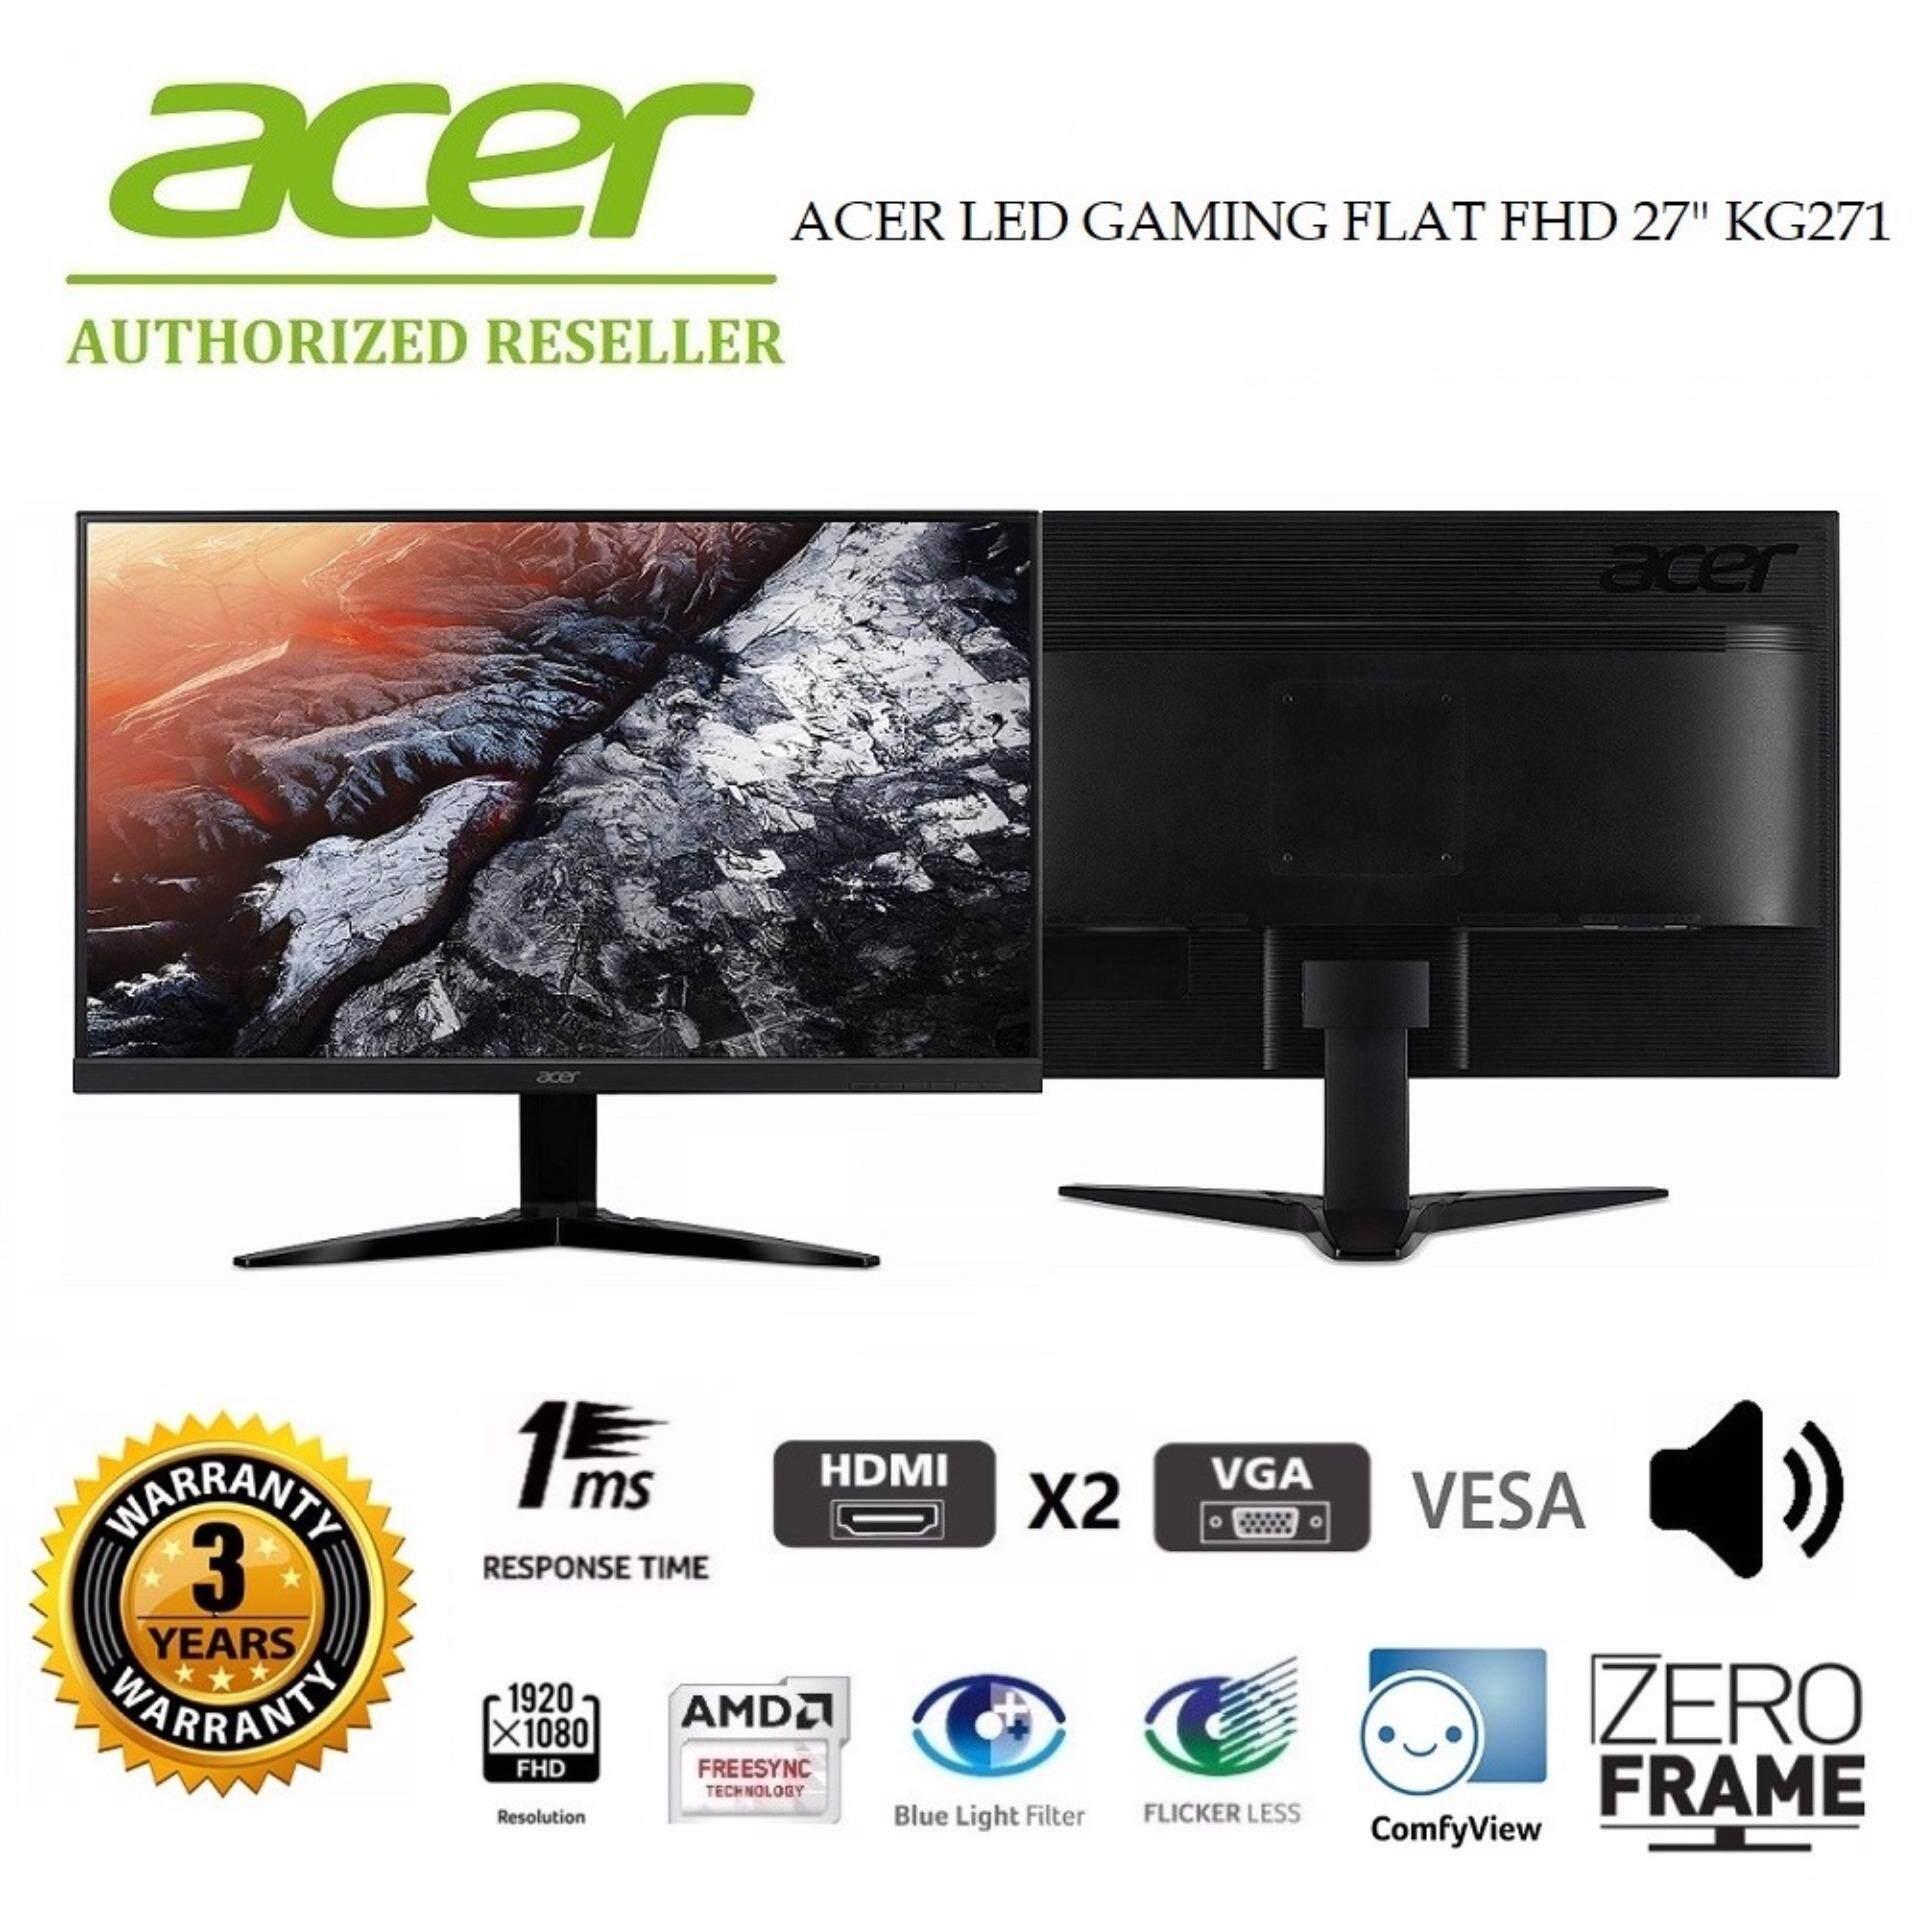 GENUINE ACER LED GAMING FLAT FHD 27 KG271 LCD MONITOR (1MS/VGA/HDMIx2/VESA/SPK/FREE-SYNC/75GHZ) (UM.HX1SM.002) BLACK Malaysia